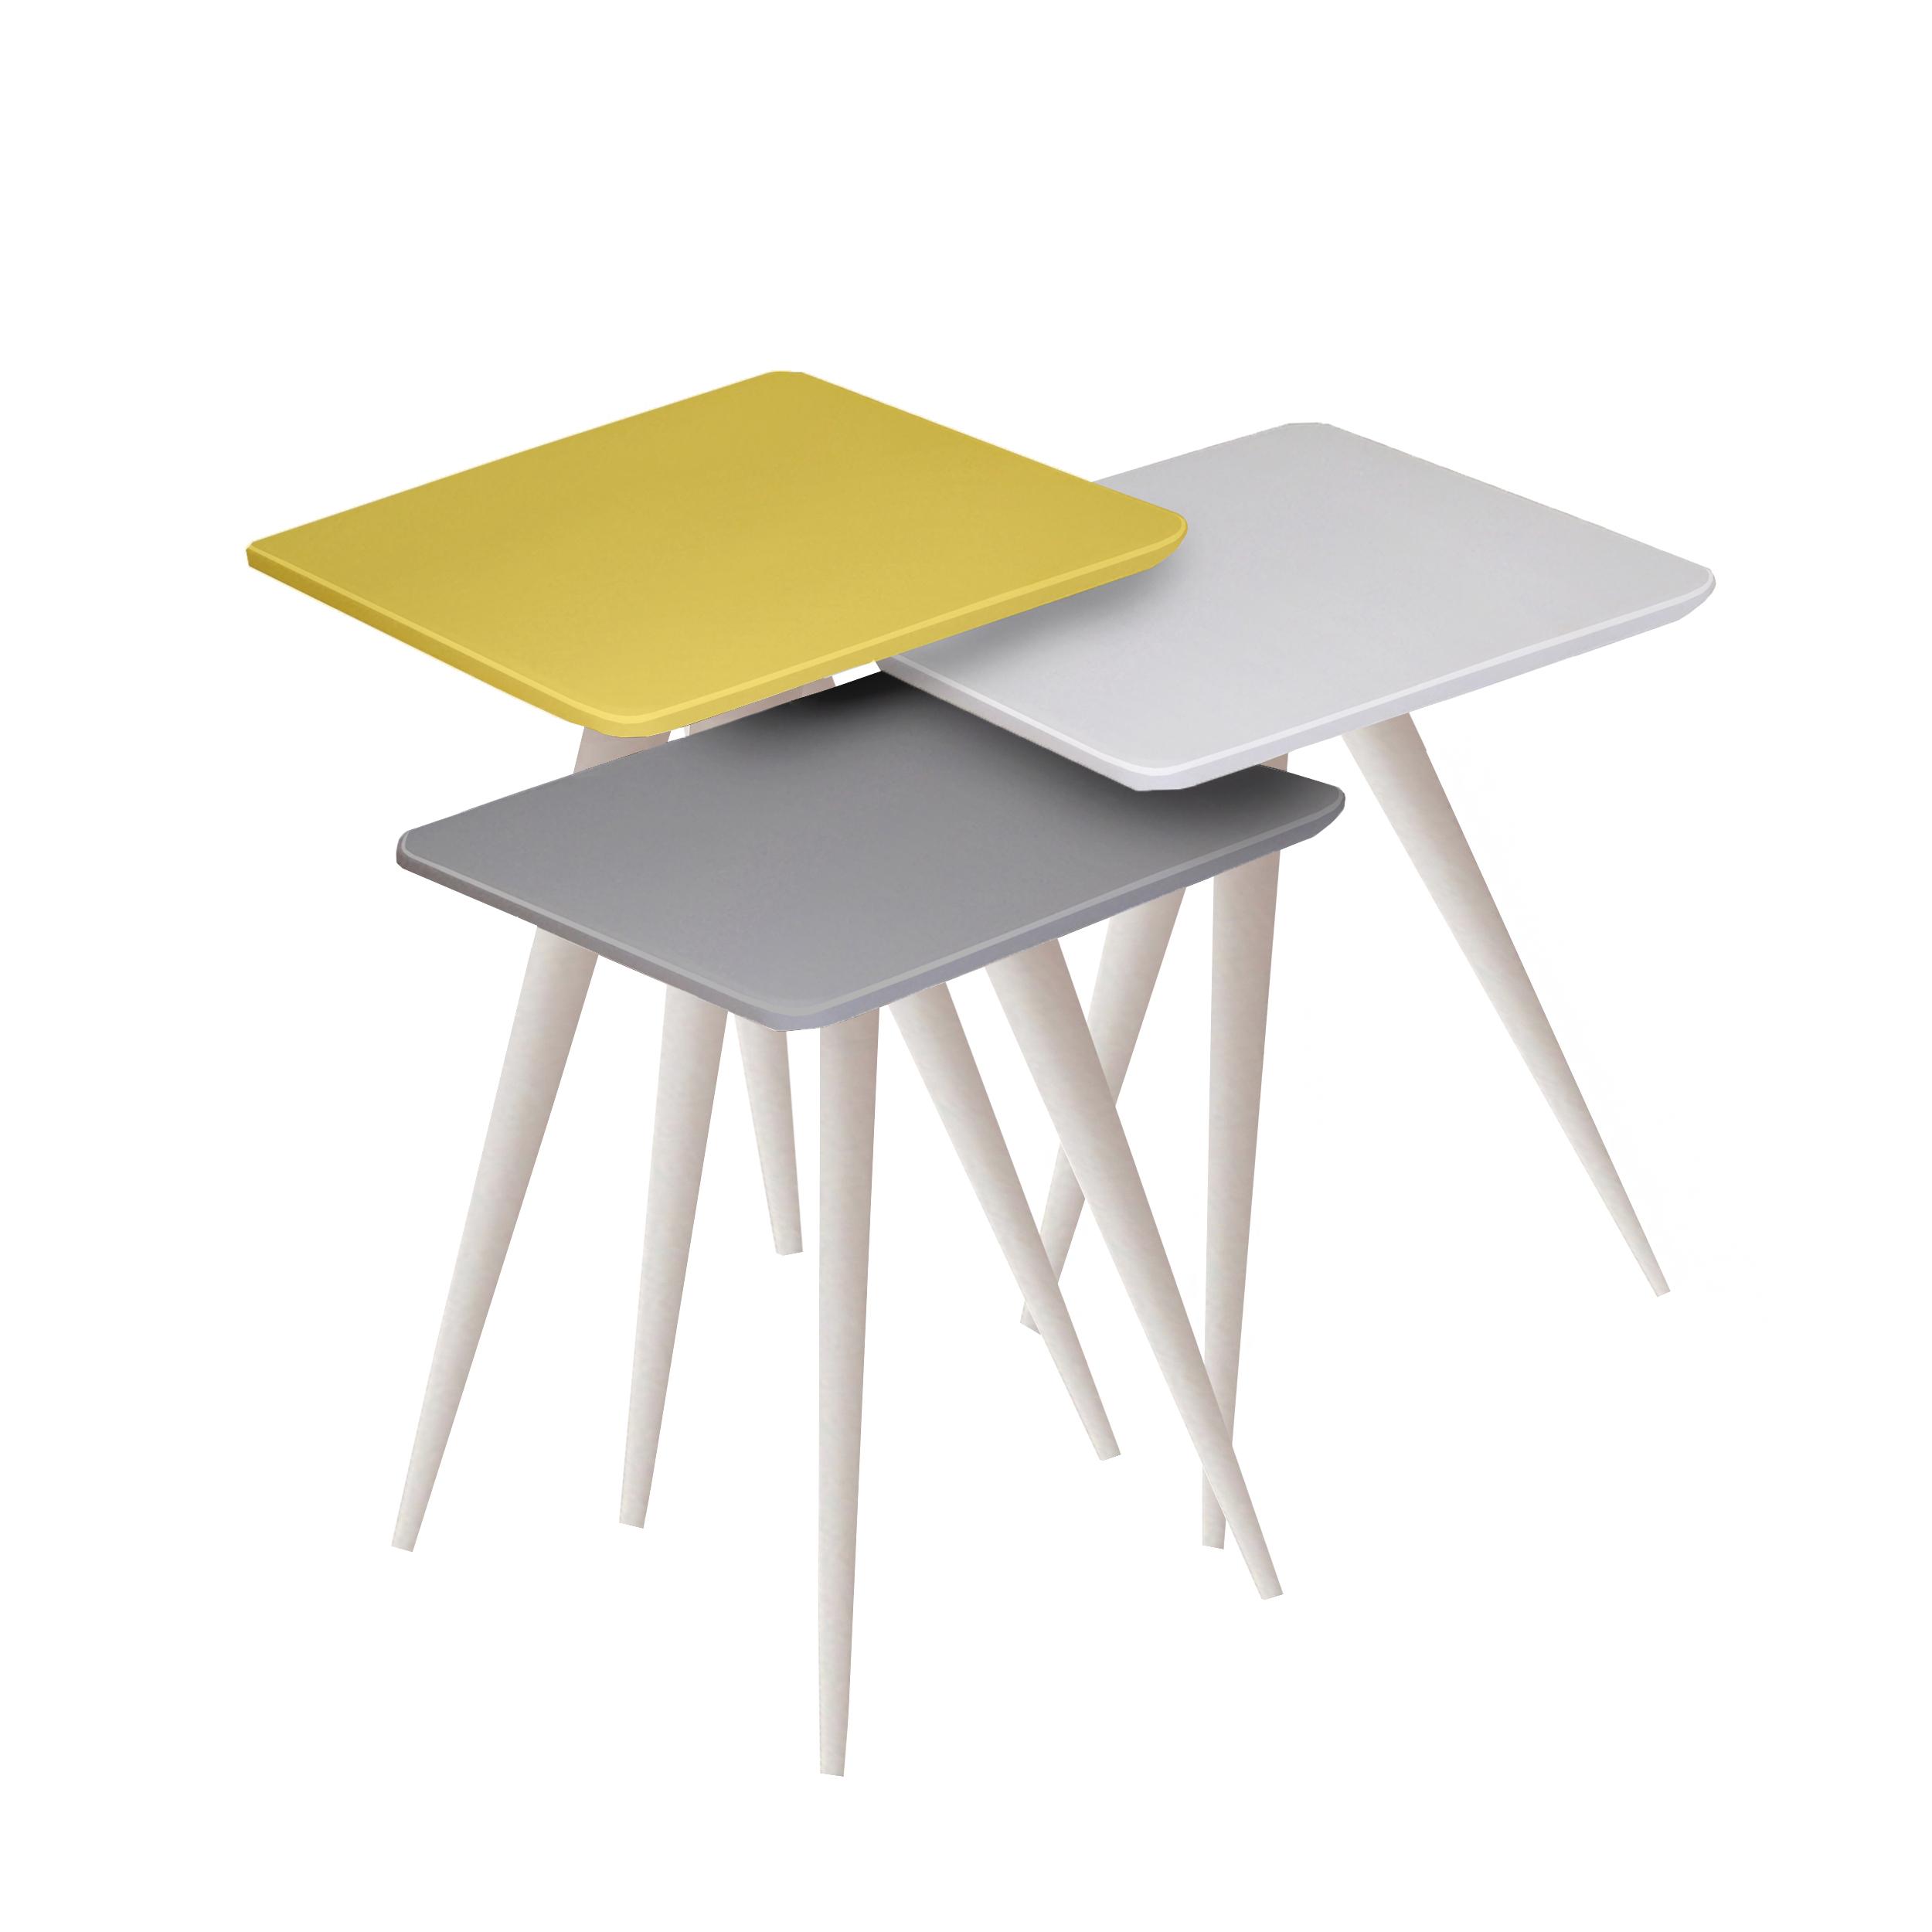 قیمت                      میز عسلی مدل 123 کد 13 مجموعه 3 عددی